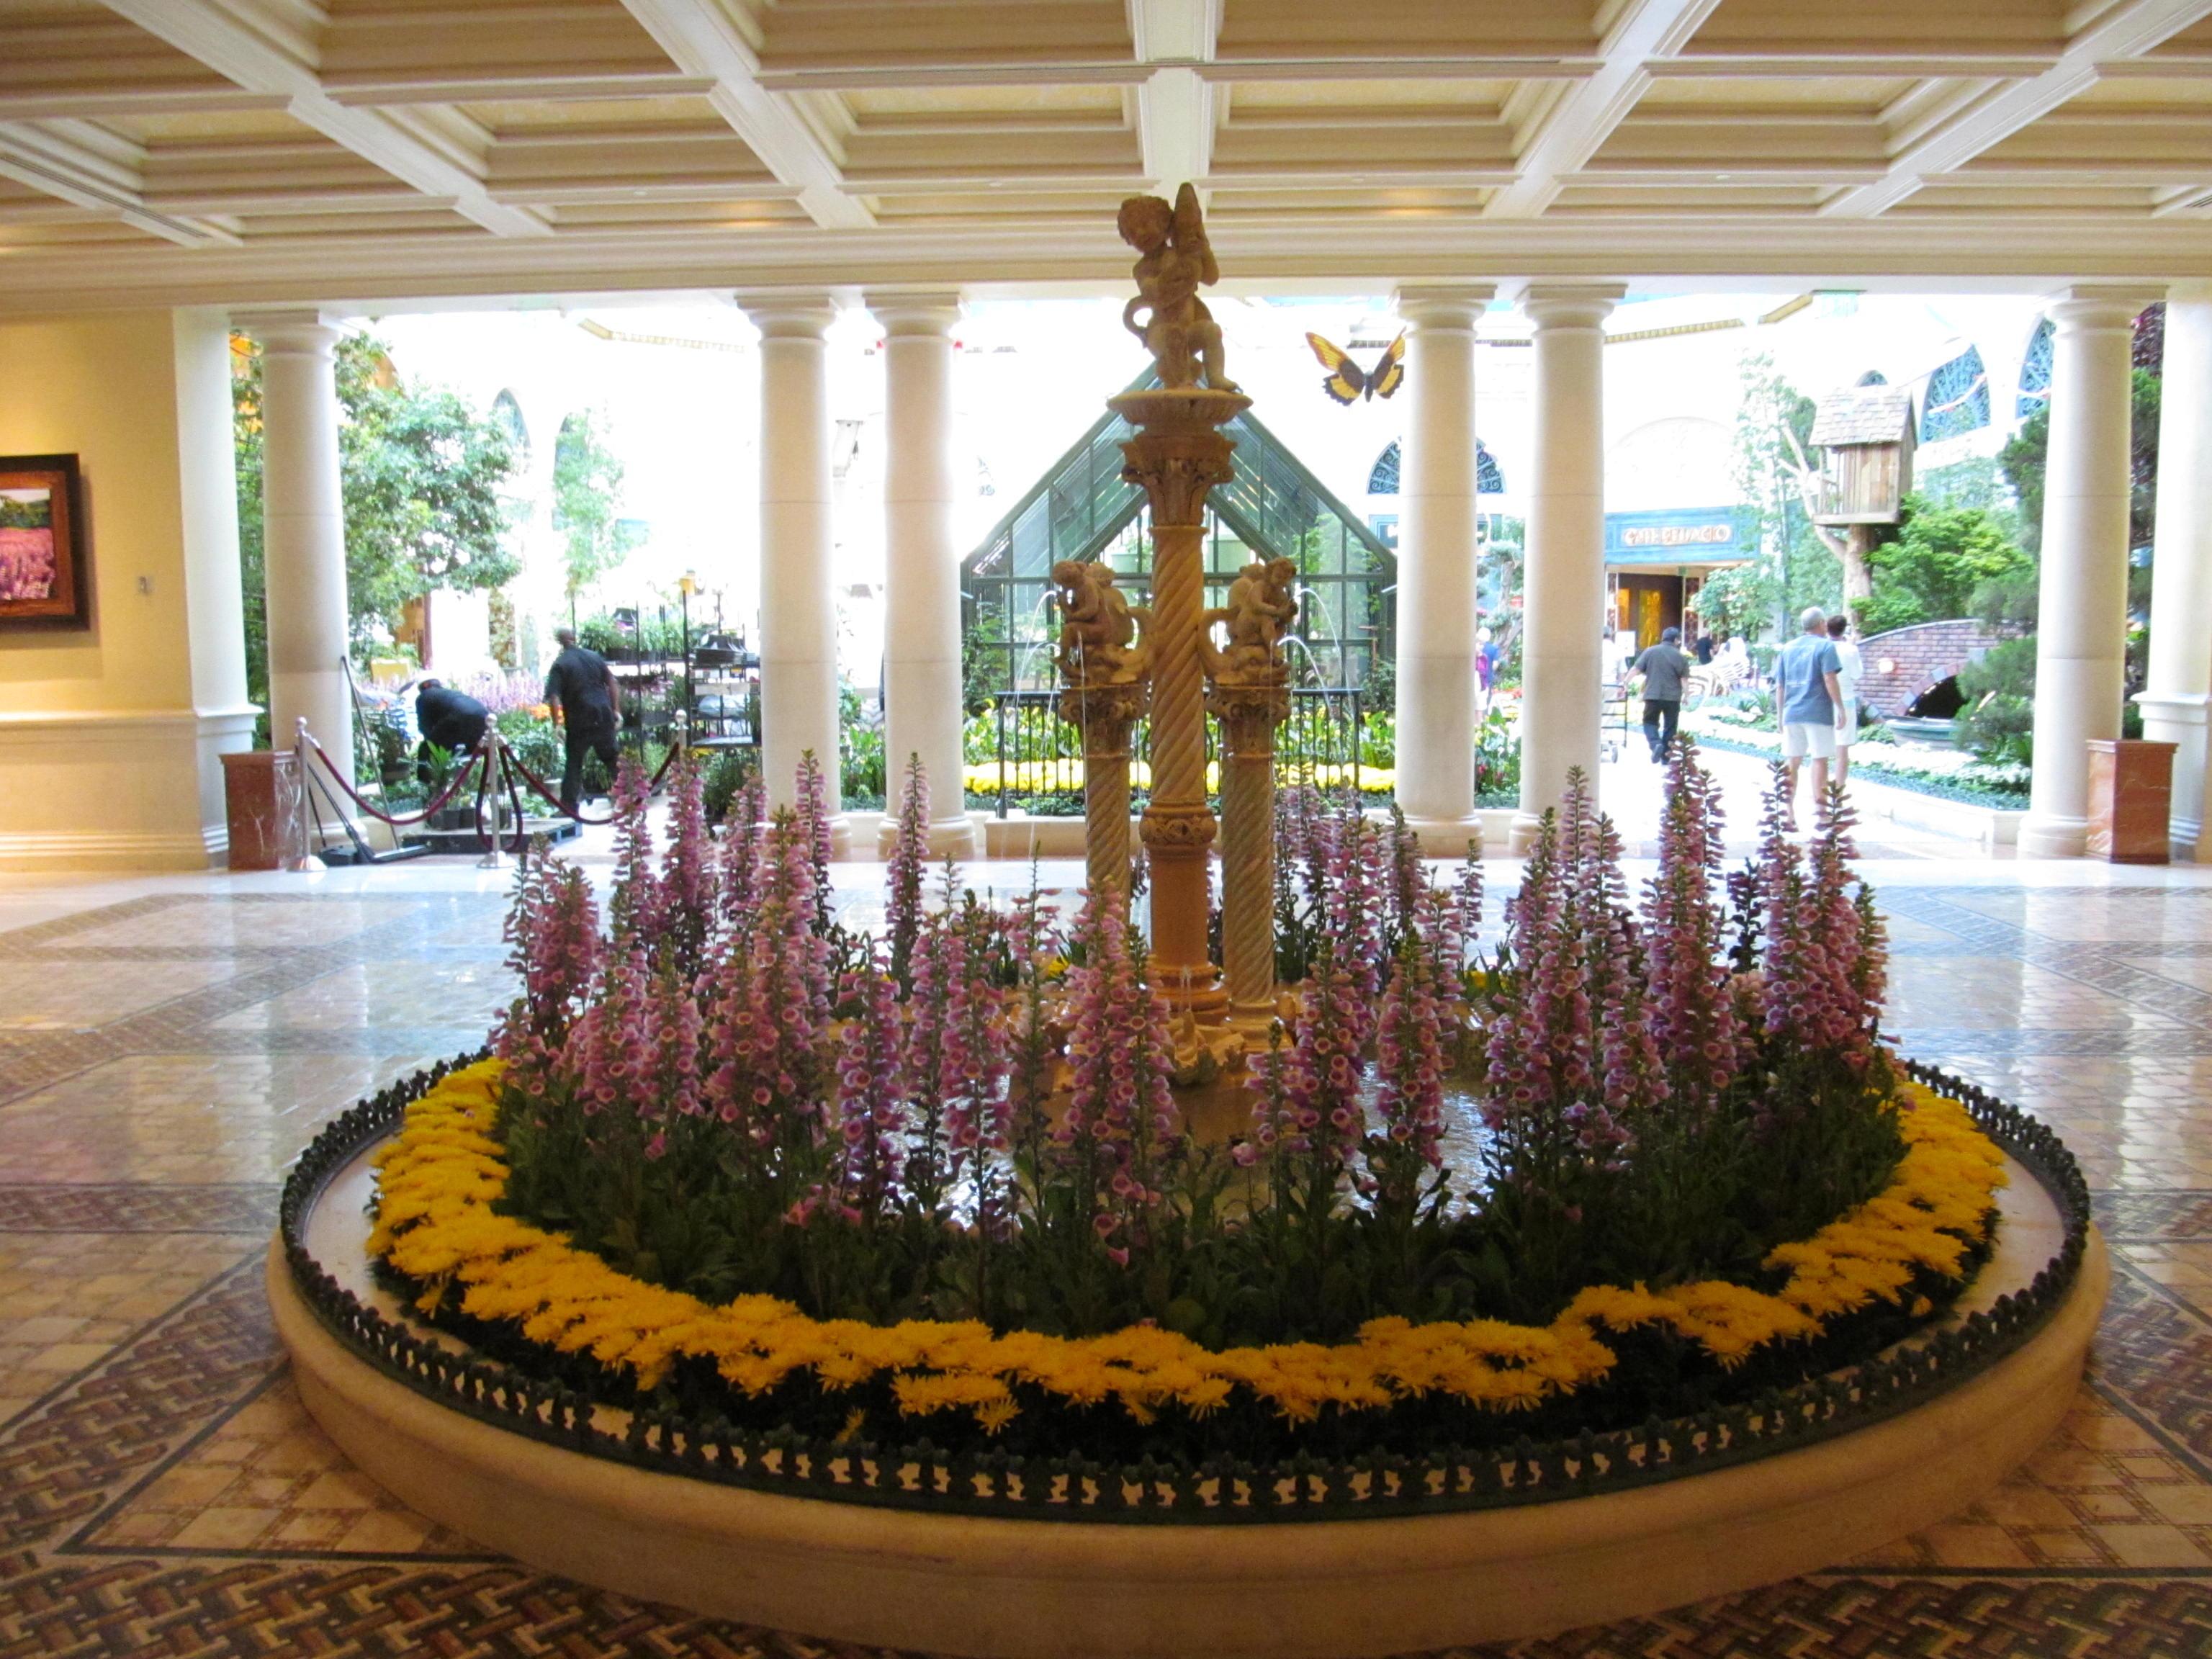 The Bellagio hotel lobby in Las Vegas Stock Photo ... |Las Vegas Bellagio Hotel Lobby